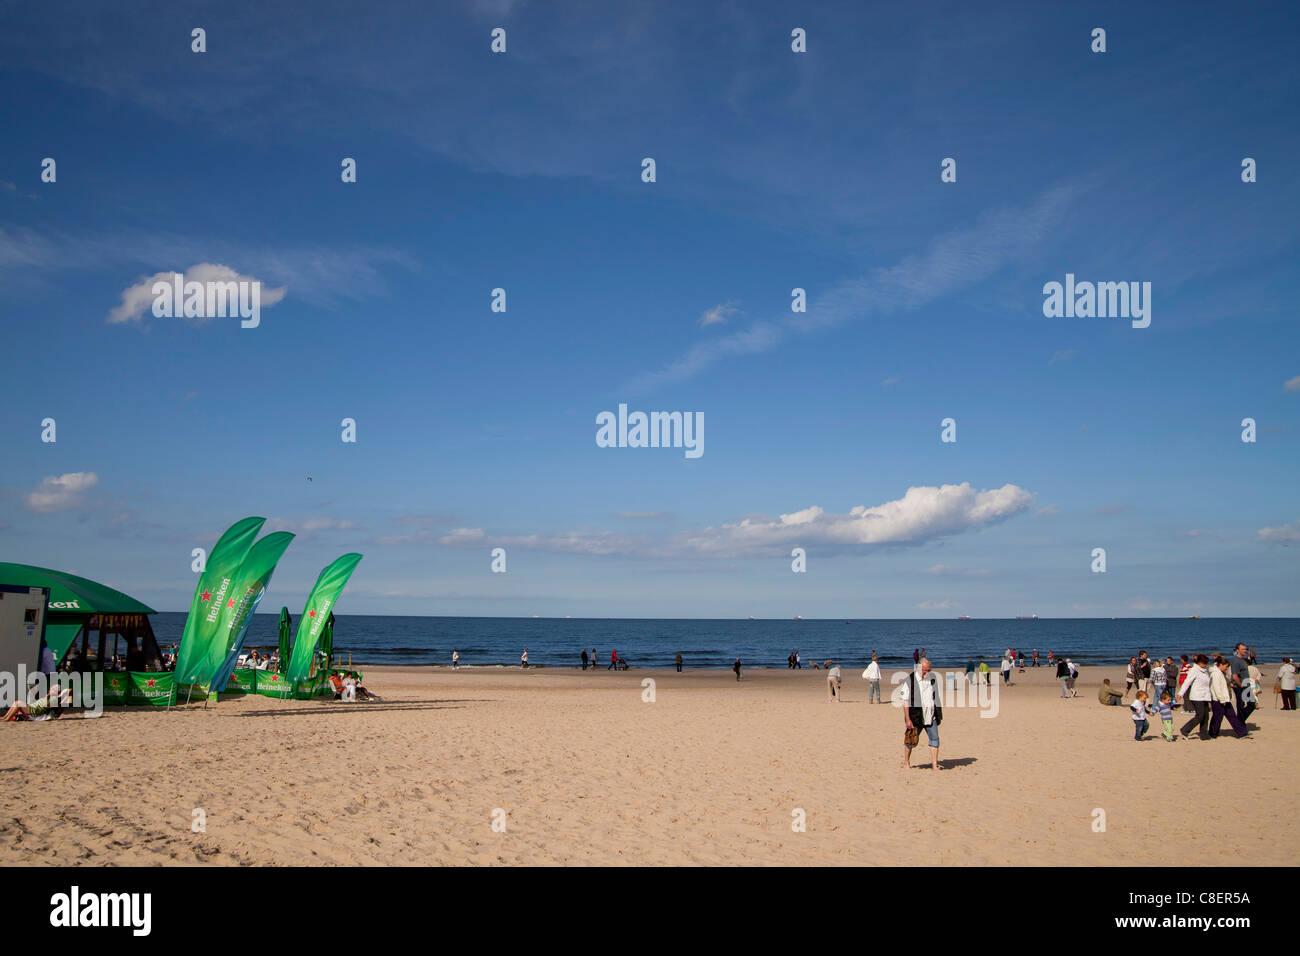 the beach of the polish seaside resort Swinoujscie, Uznam Island, Poland, Europe Stock Photo